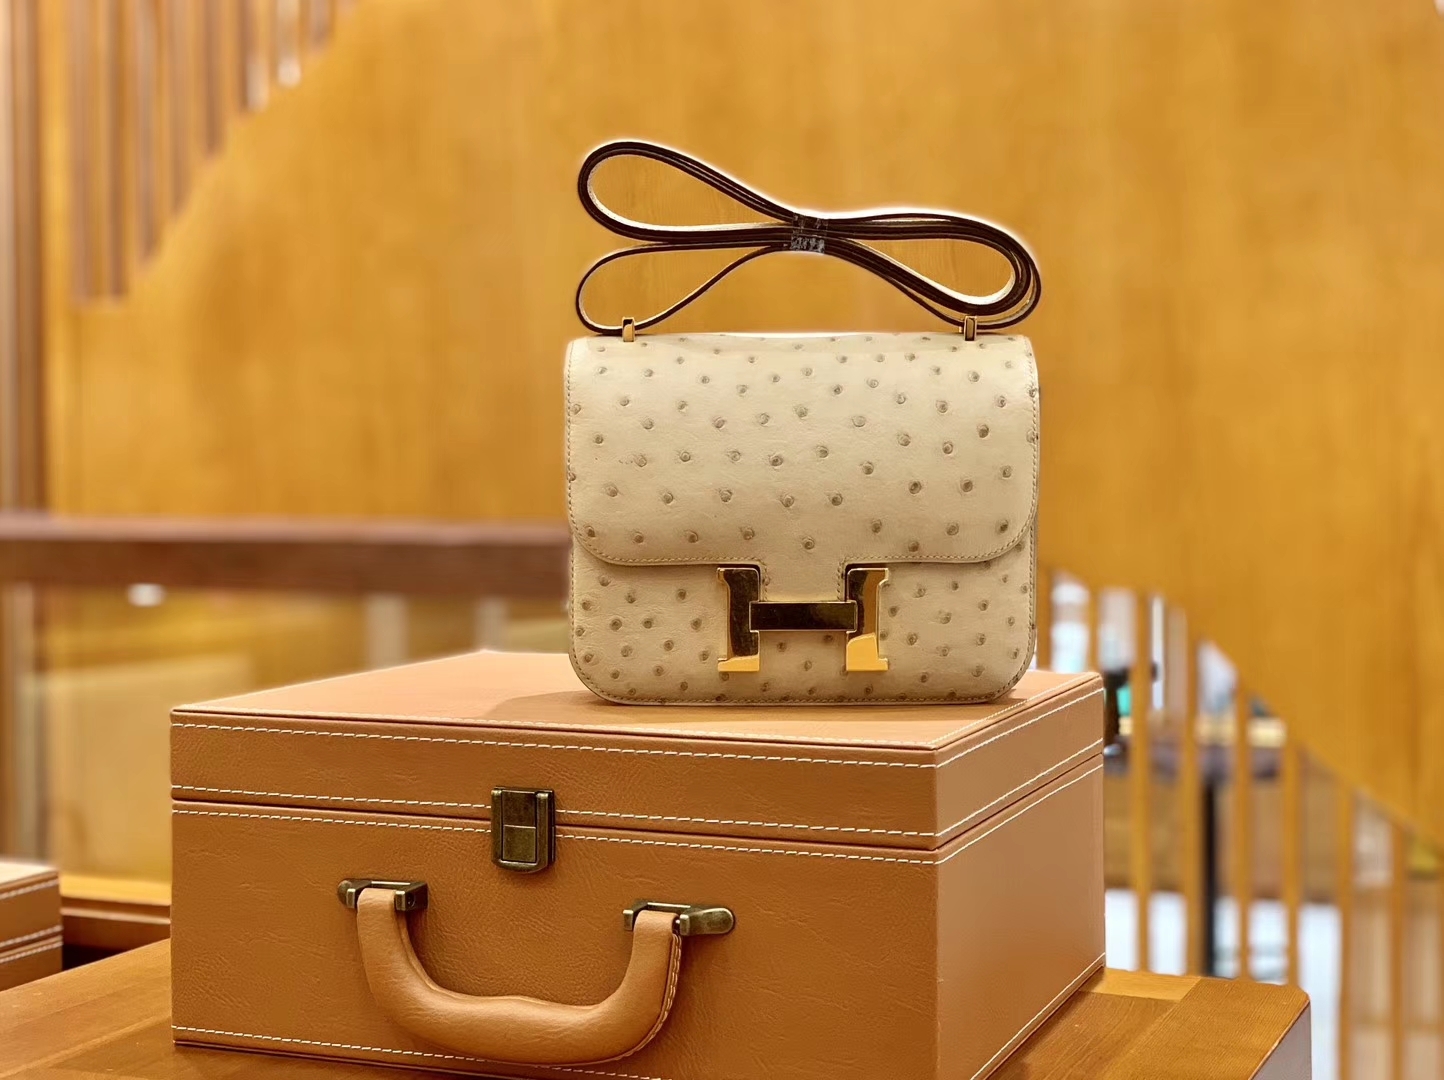 Hermès(爱马仕)Constance 空姐包 杏色 南非进口鸵鸟皮 18cm